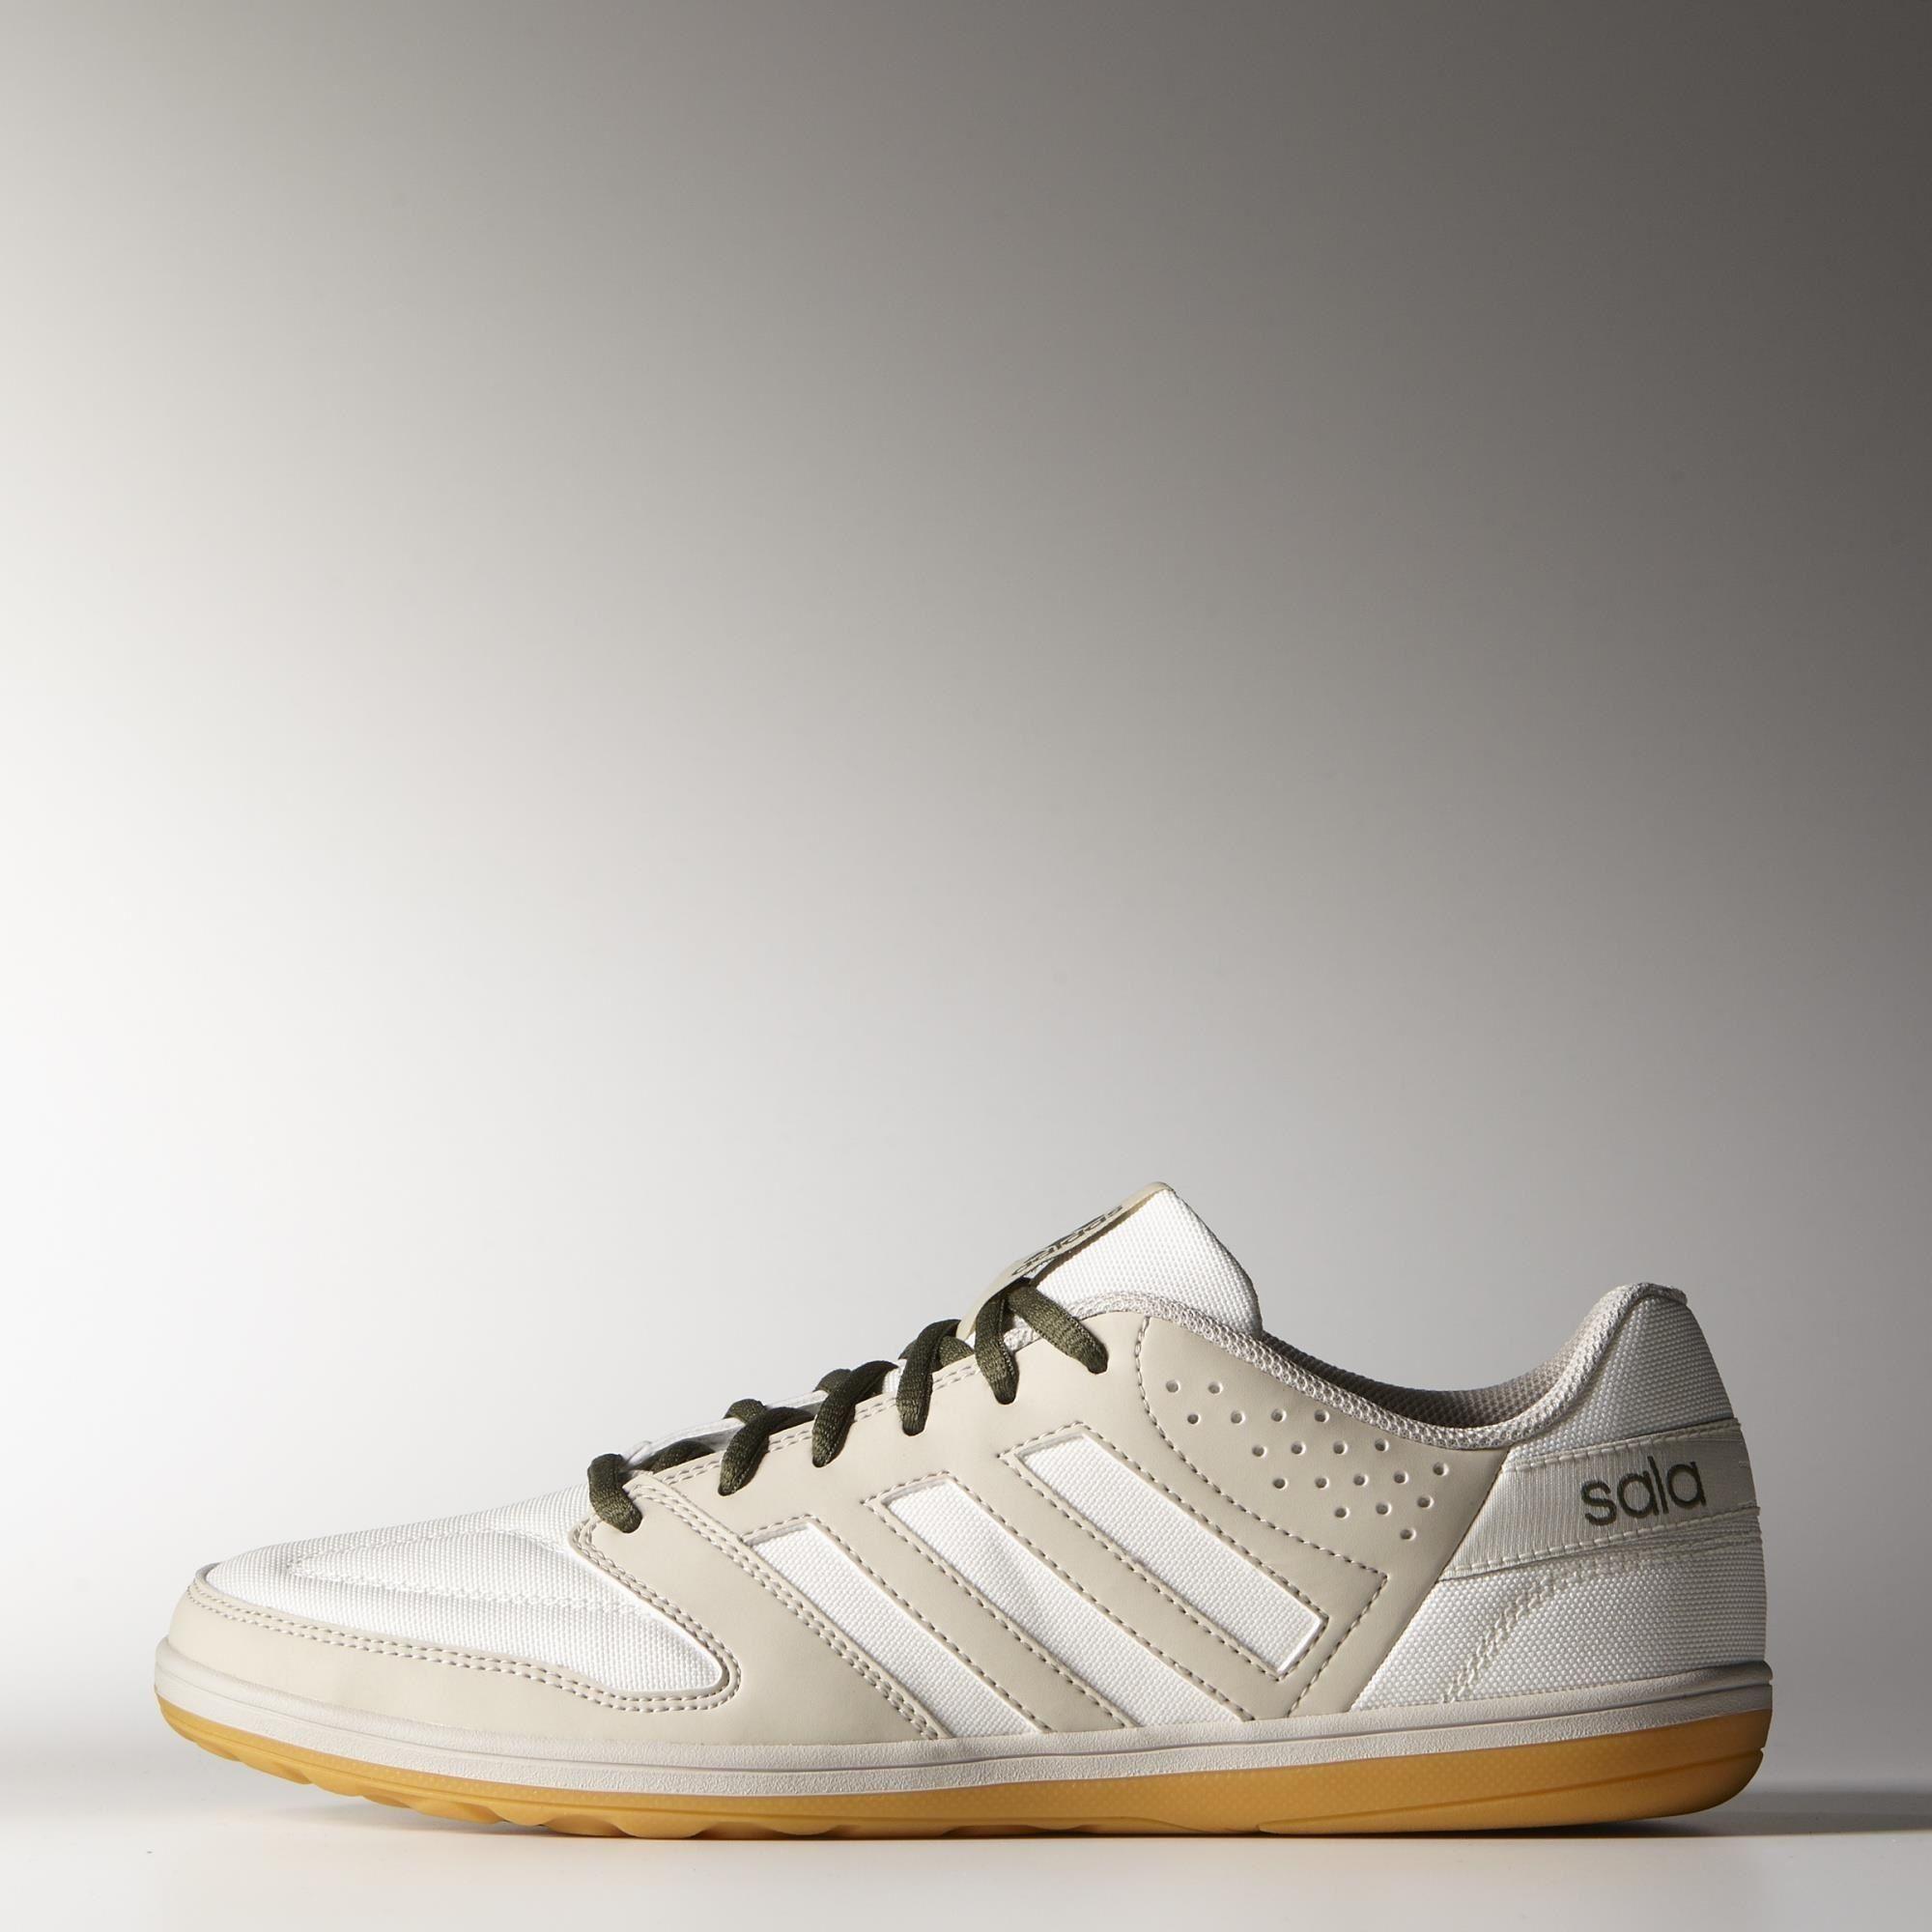 adidas - Guayos FF JaneirinhaSala Indoor